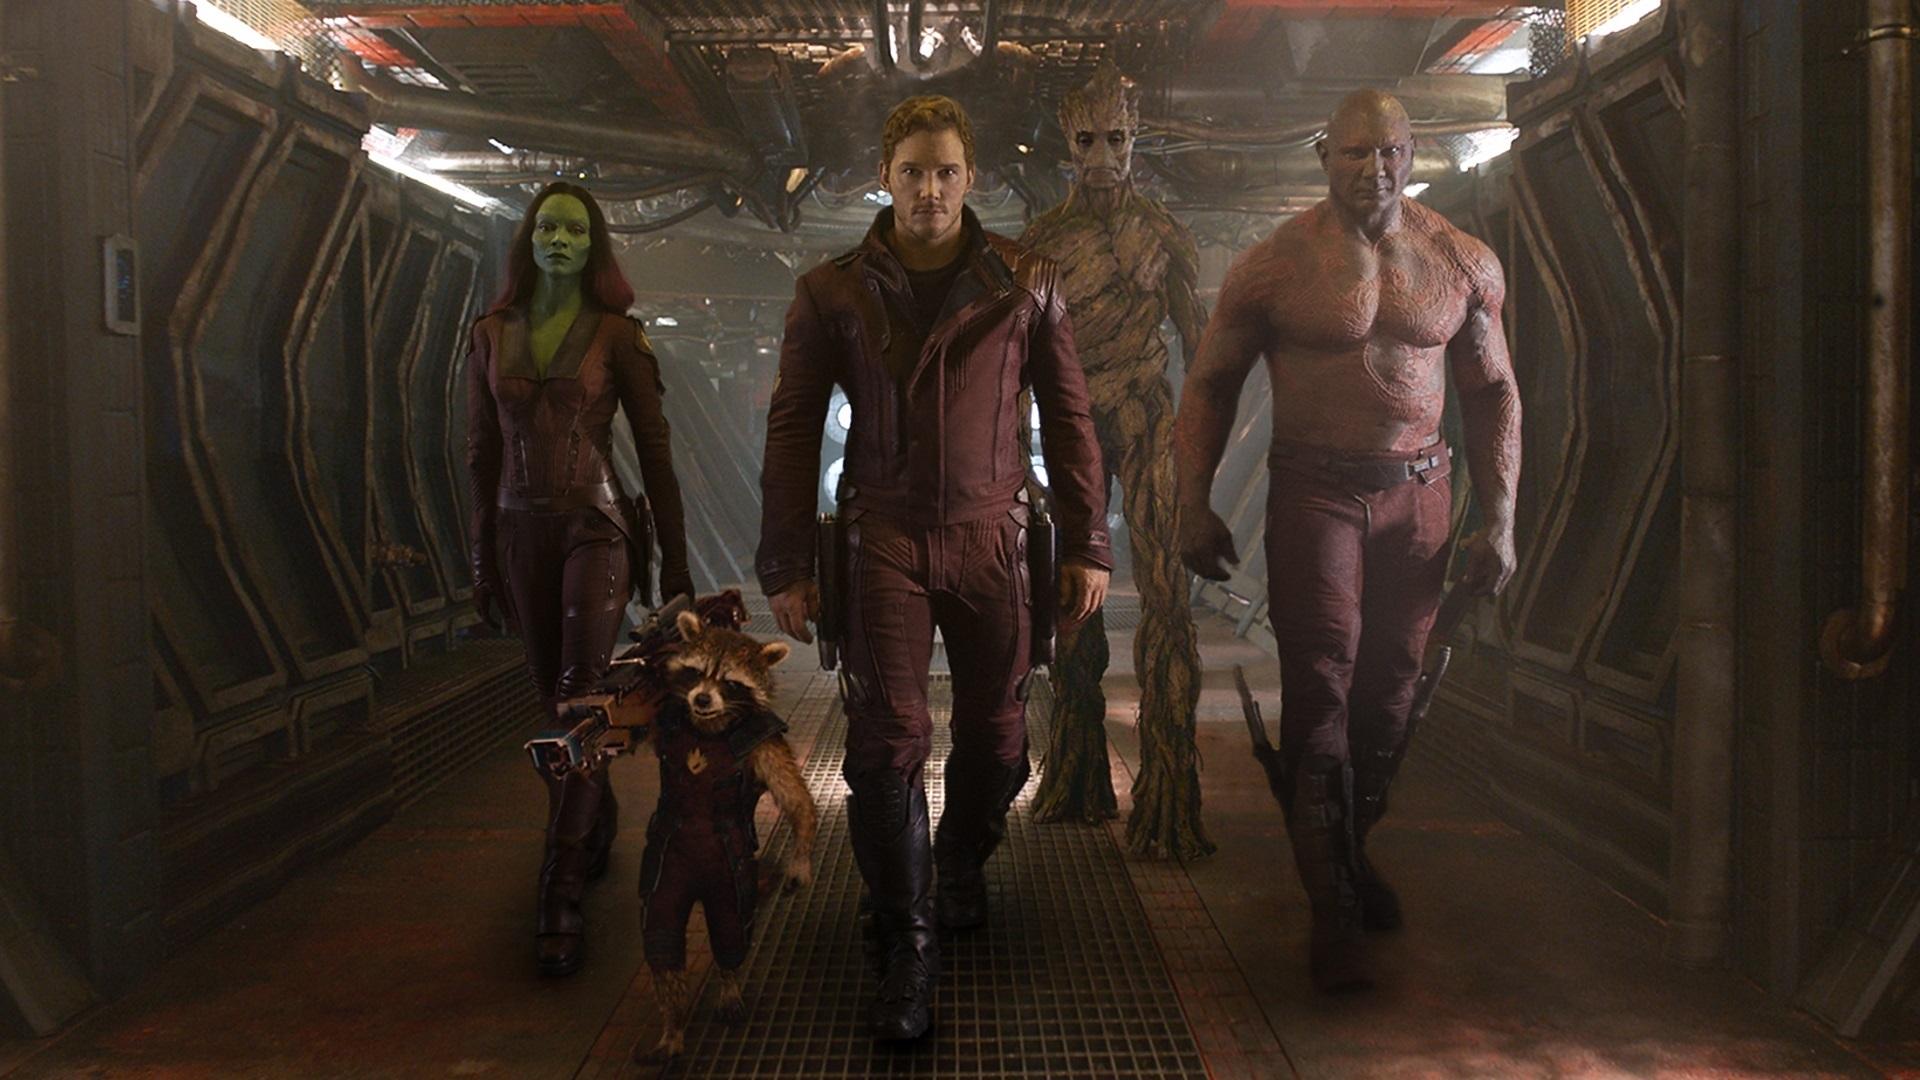 Guardians-Of-The-Galaxy-Teaser-Trailer-News-We-Live-Film.jpg